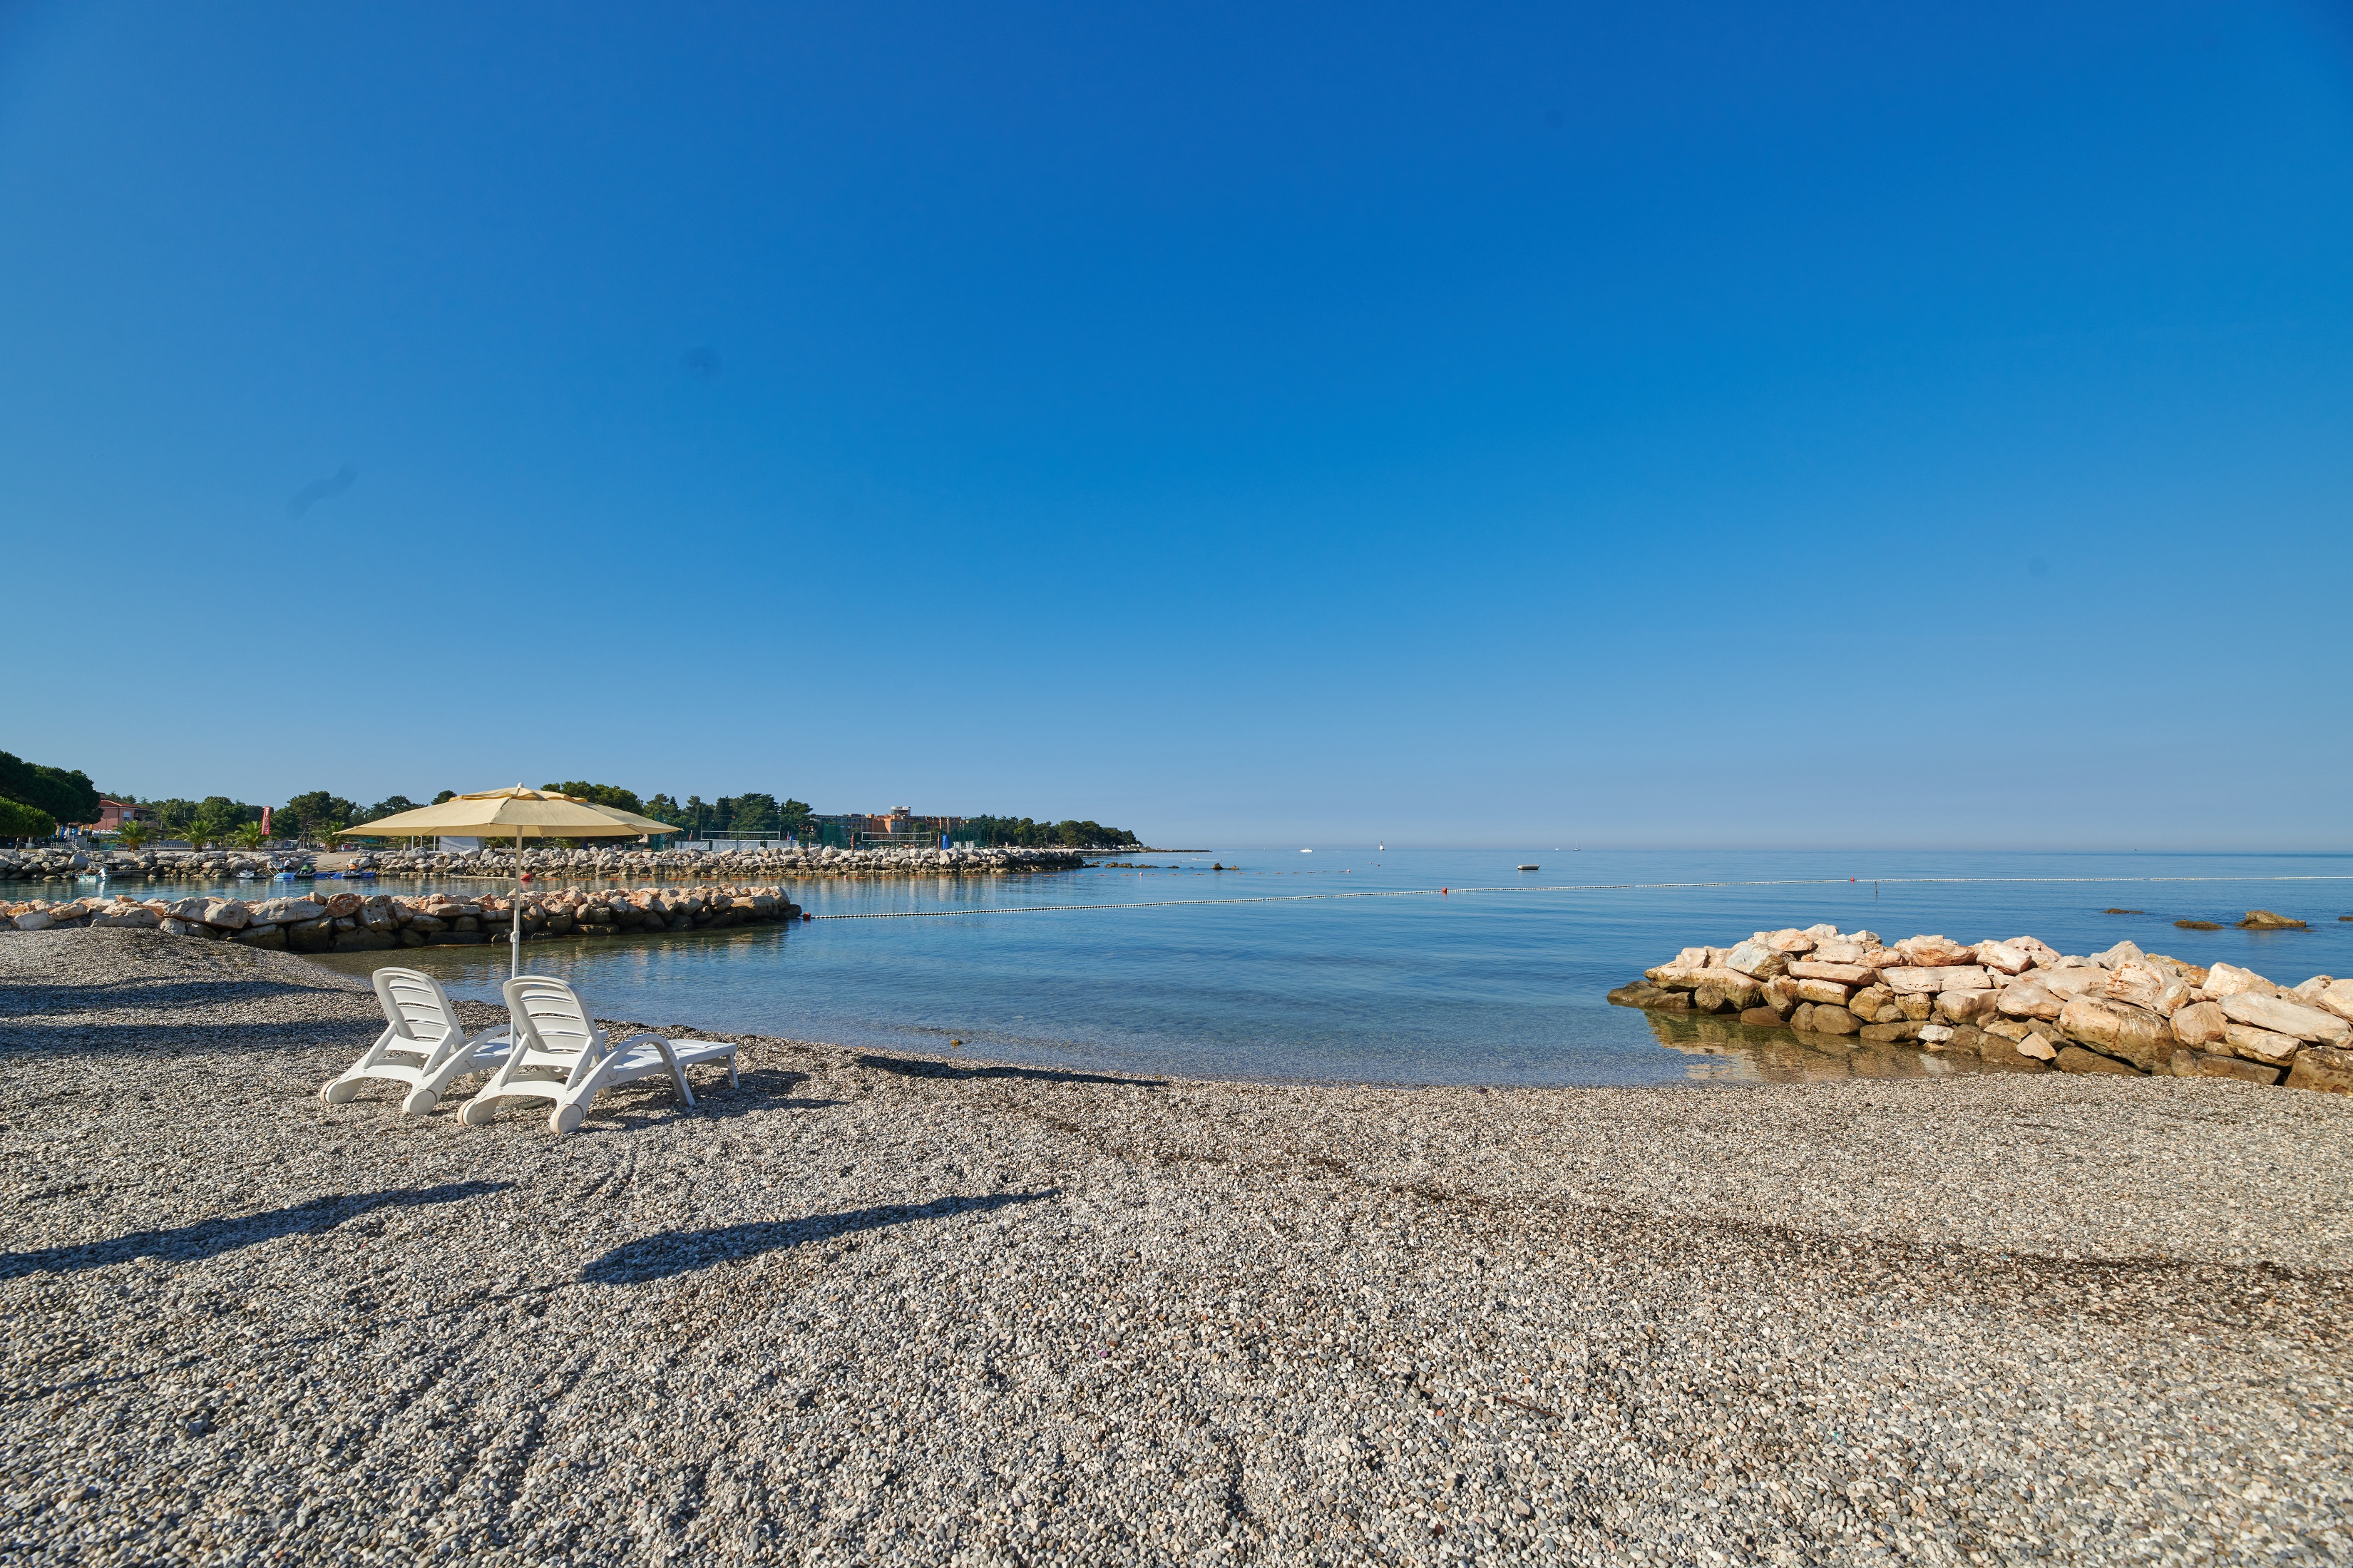 https://cms.satur.sk/data/imgs/tour_image/orig/stella_maris_resort_plava_laguna_2020_villas_beach_-resized-1800583.jpg